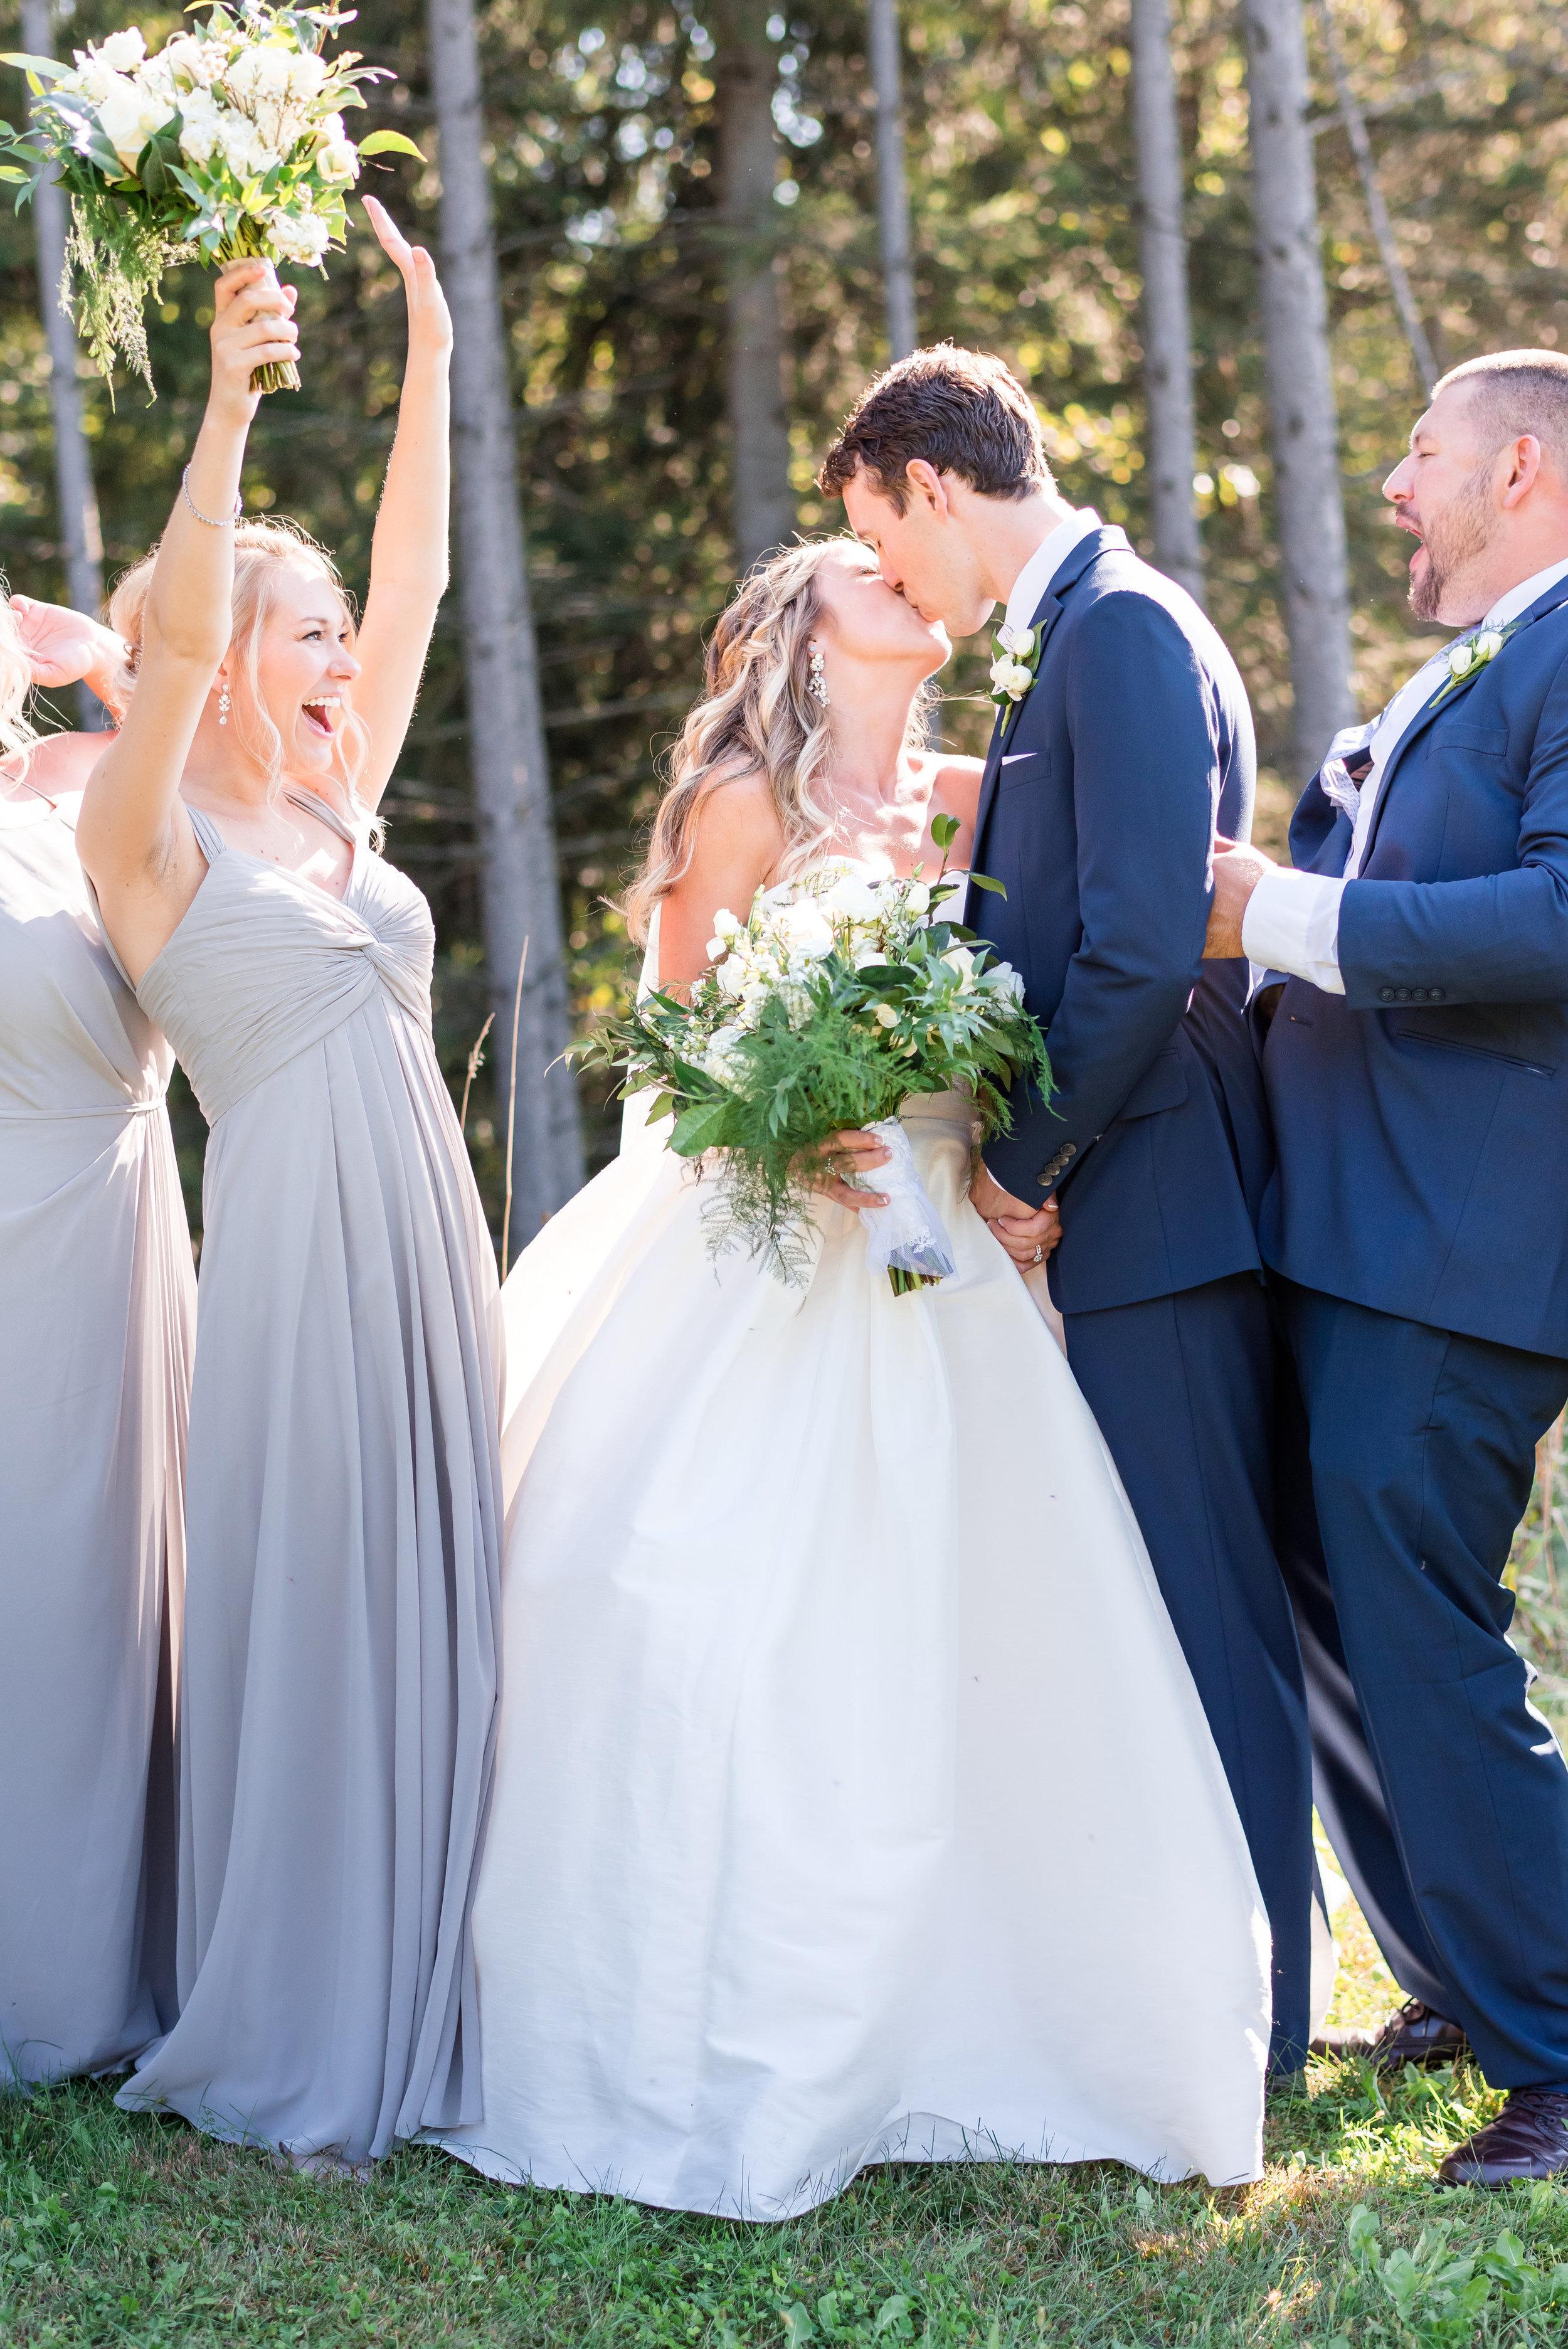 The Dugenske Wedding 9 15 18-0601.jpg